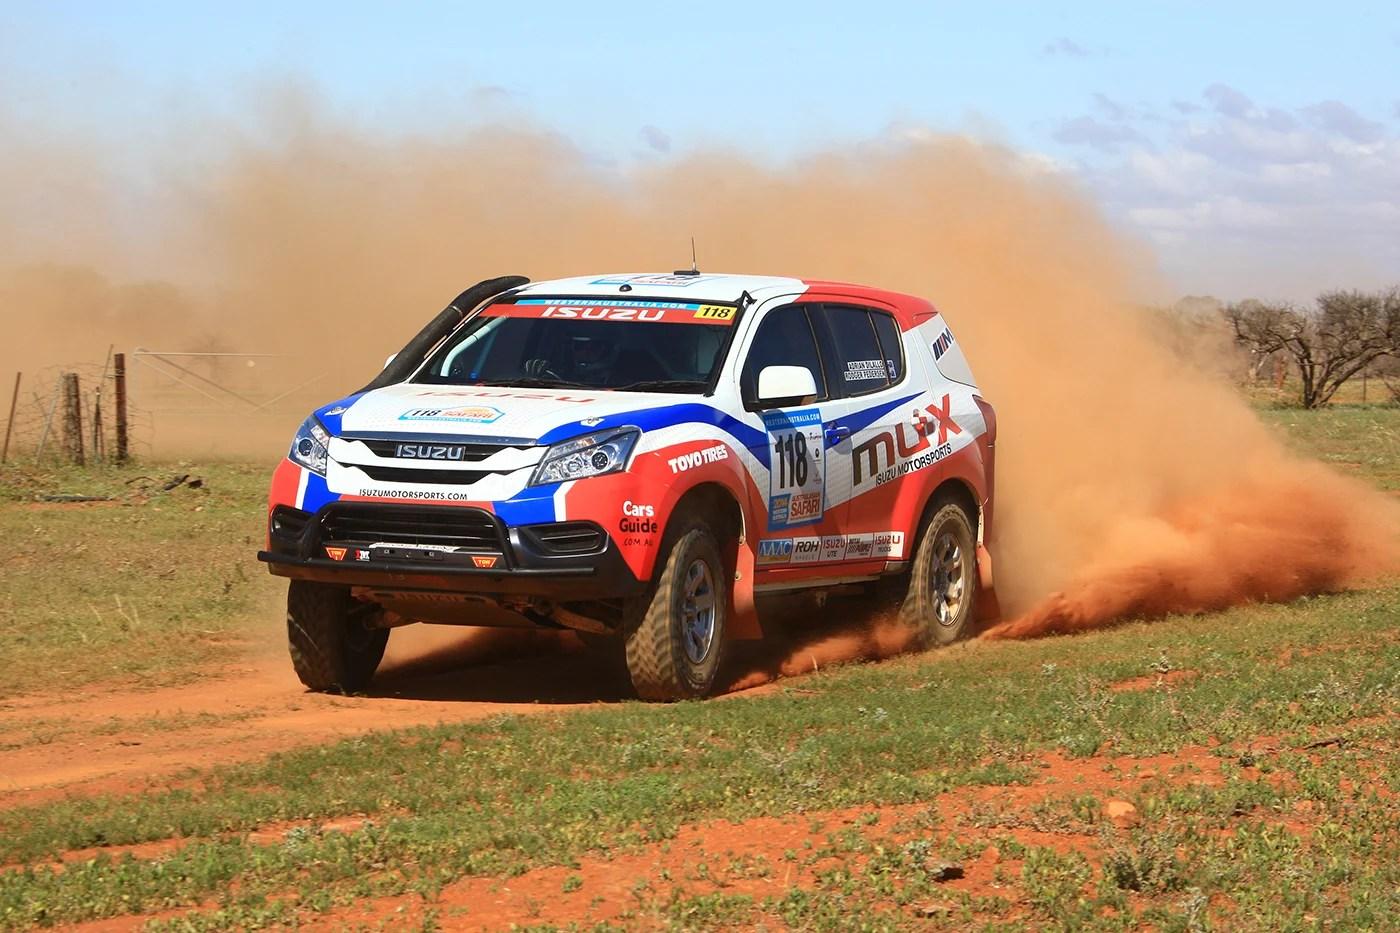 Hd Wallpapers Of New Audi Cars Isuzu Mu X Engineered In Sydney For Dakar Rally In 2015